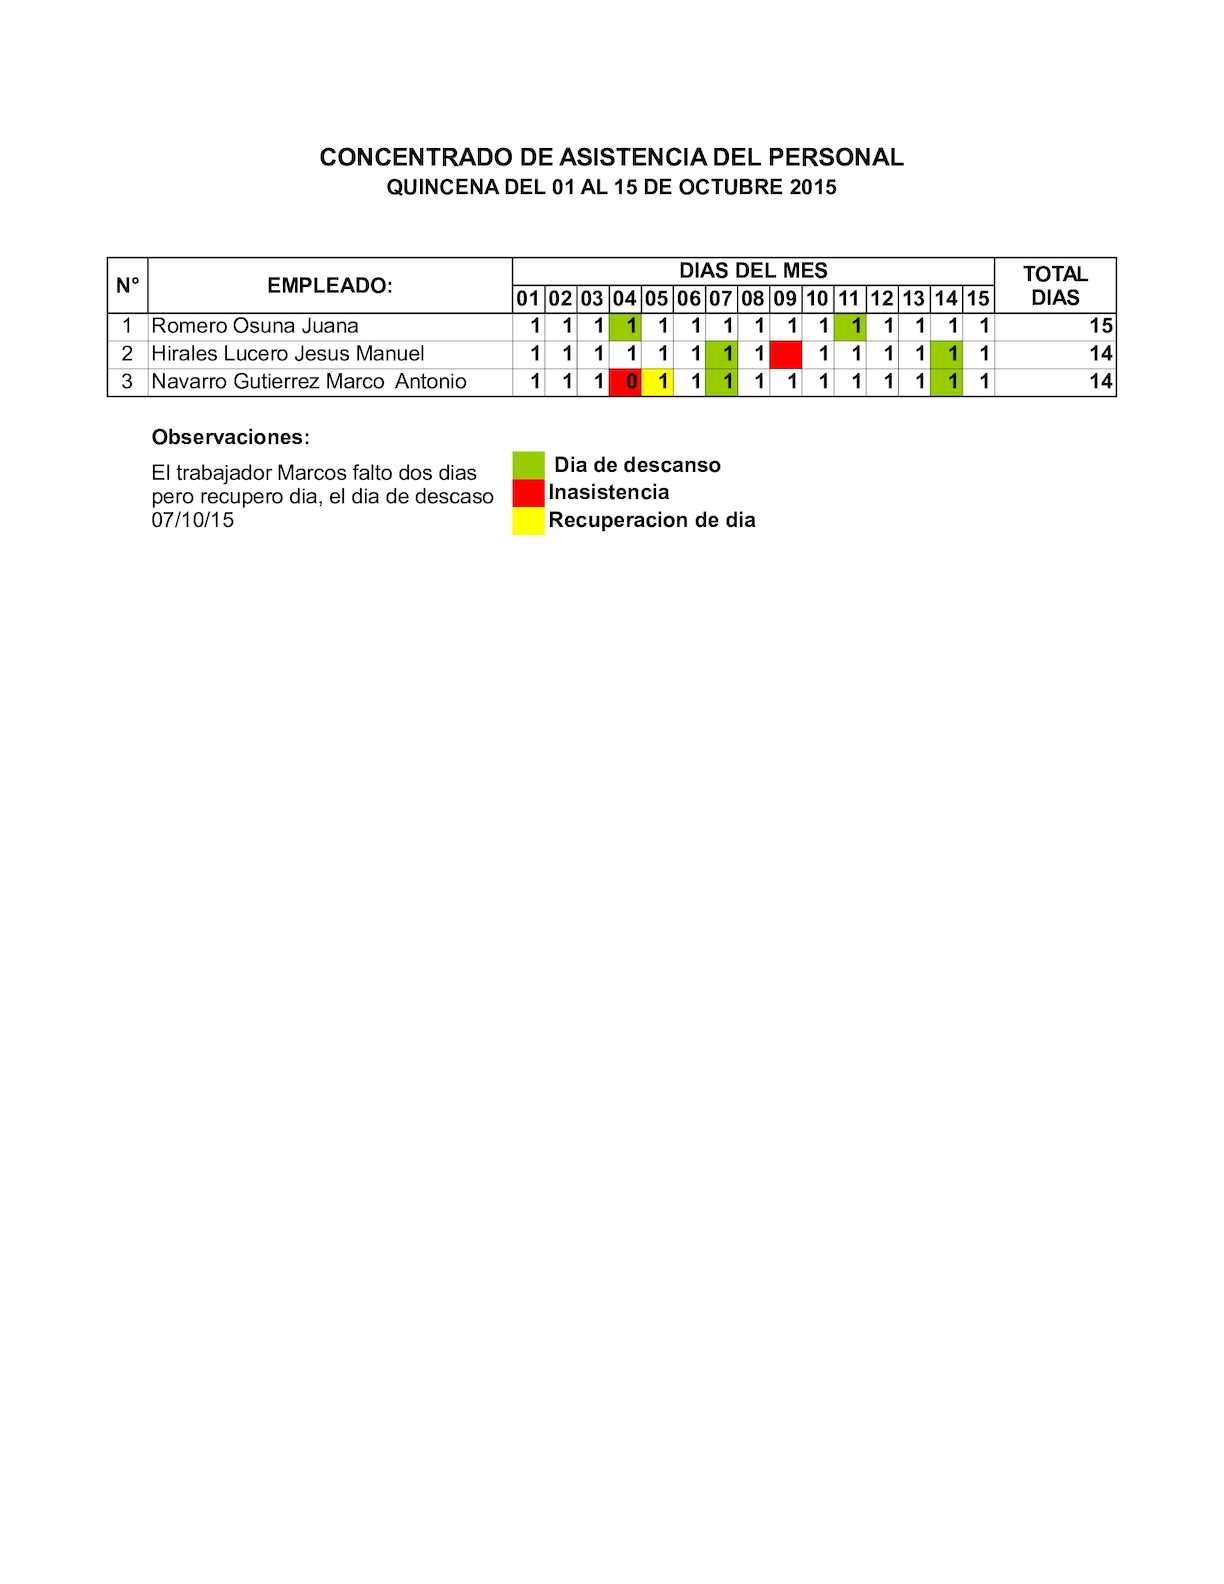 Calaméo - Concentradconetrado de asistencias para RH o De Asistencias